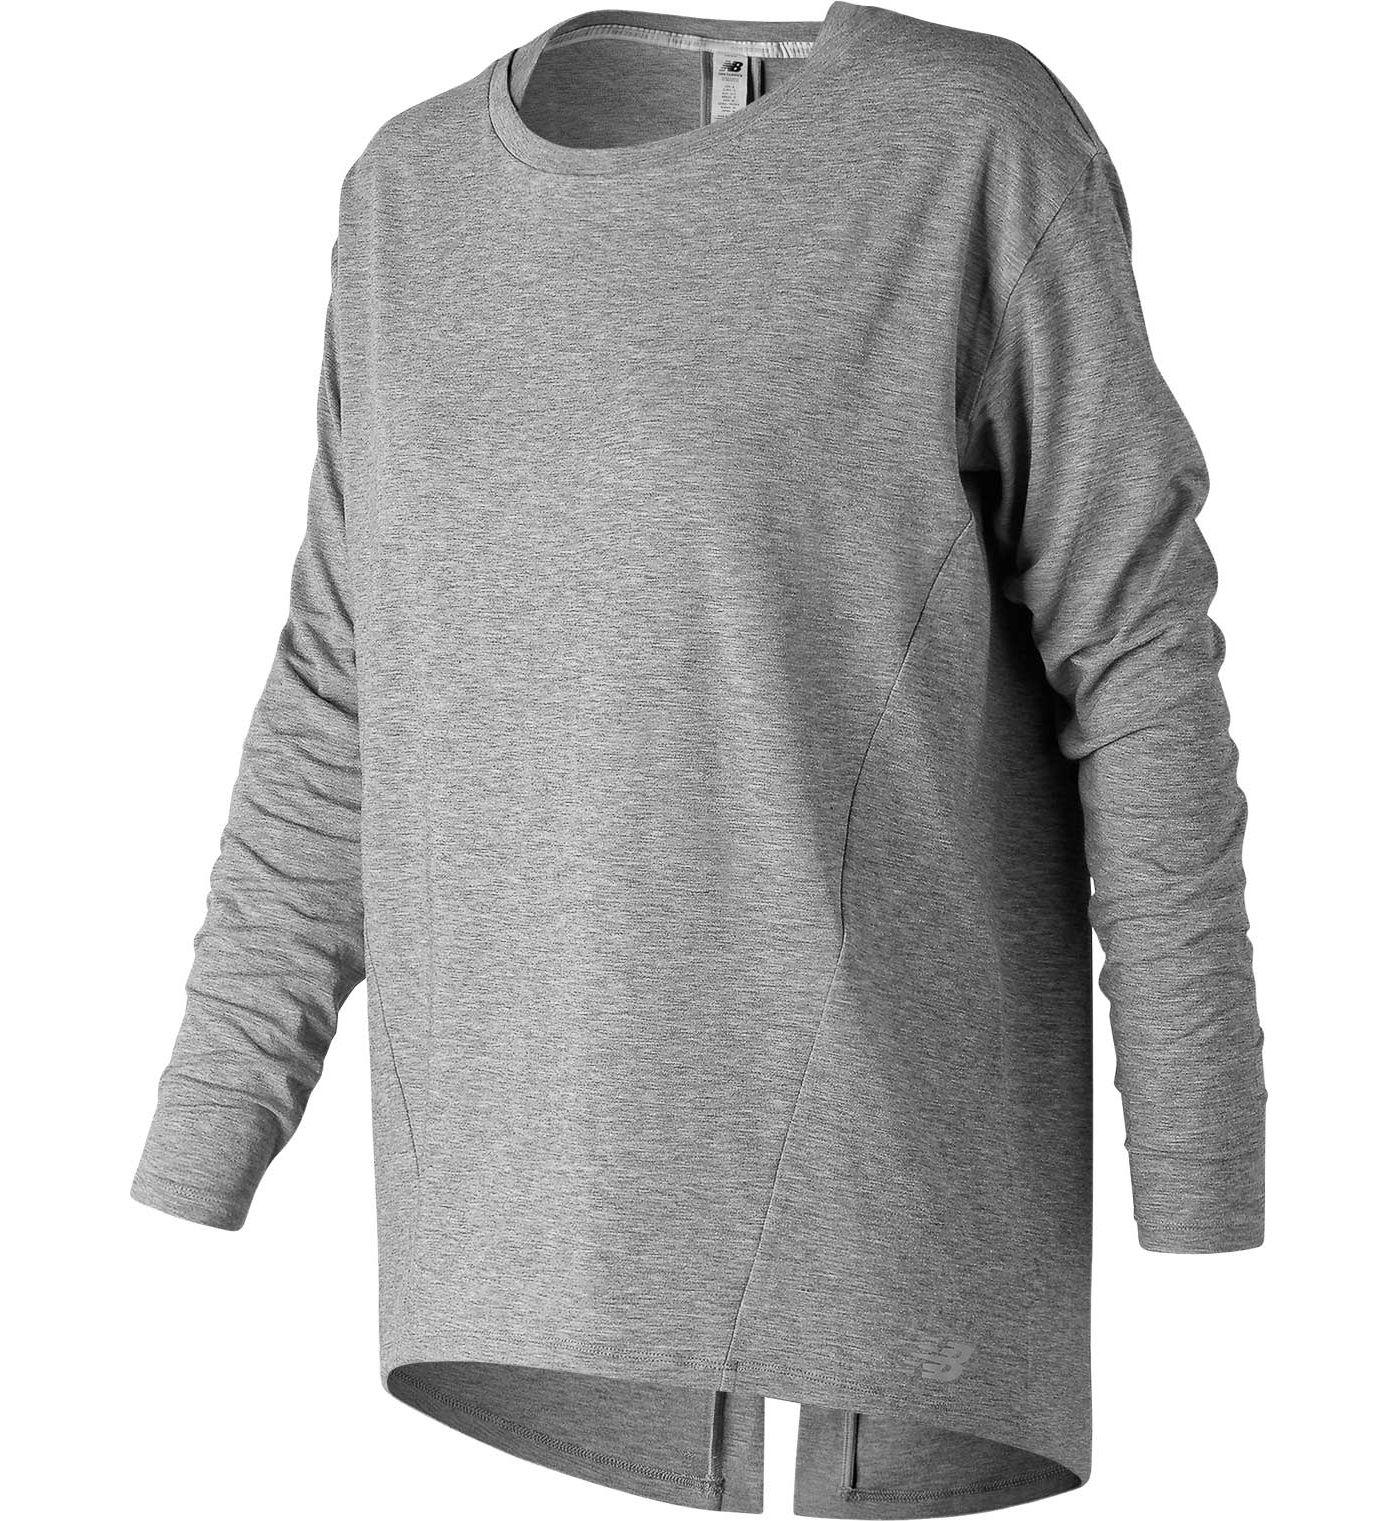 New Balance Women's Studio Relaxed Long Sleeve Shirt